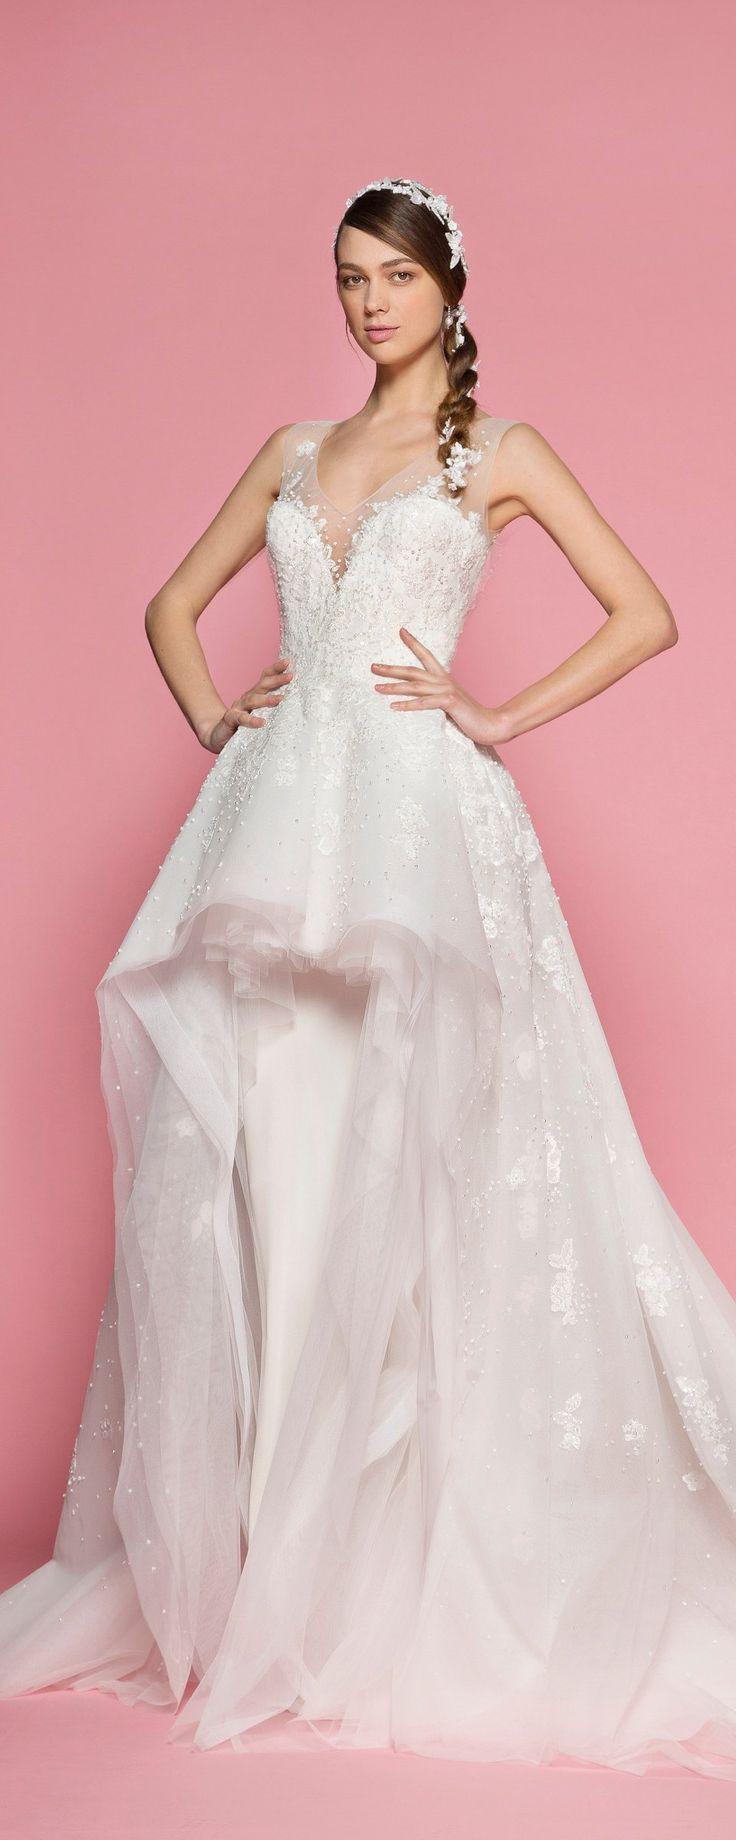 659 best Novias images on Pinterest | Wedding frocks, Bridal gowns ...